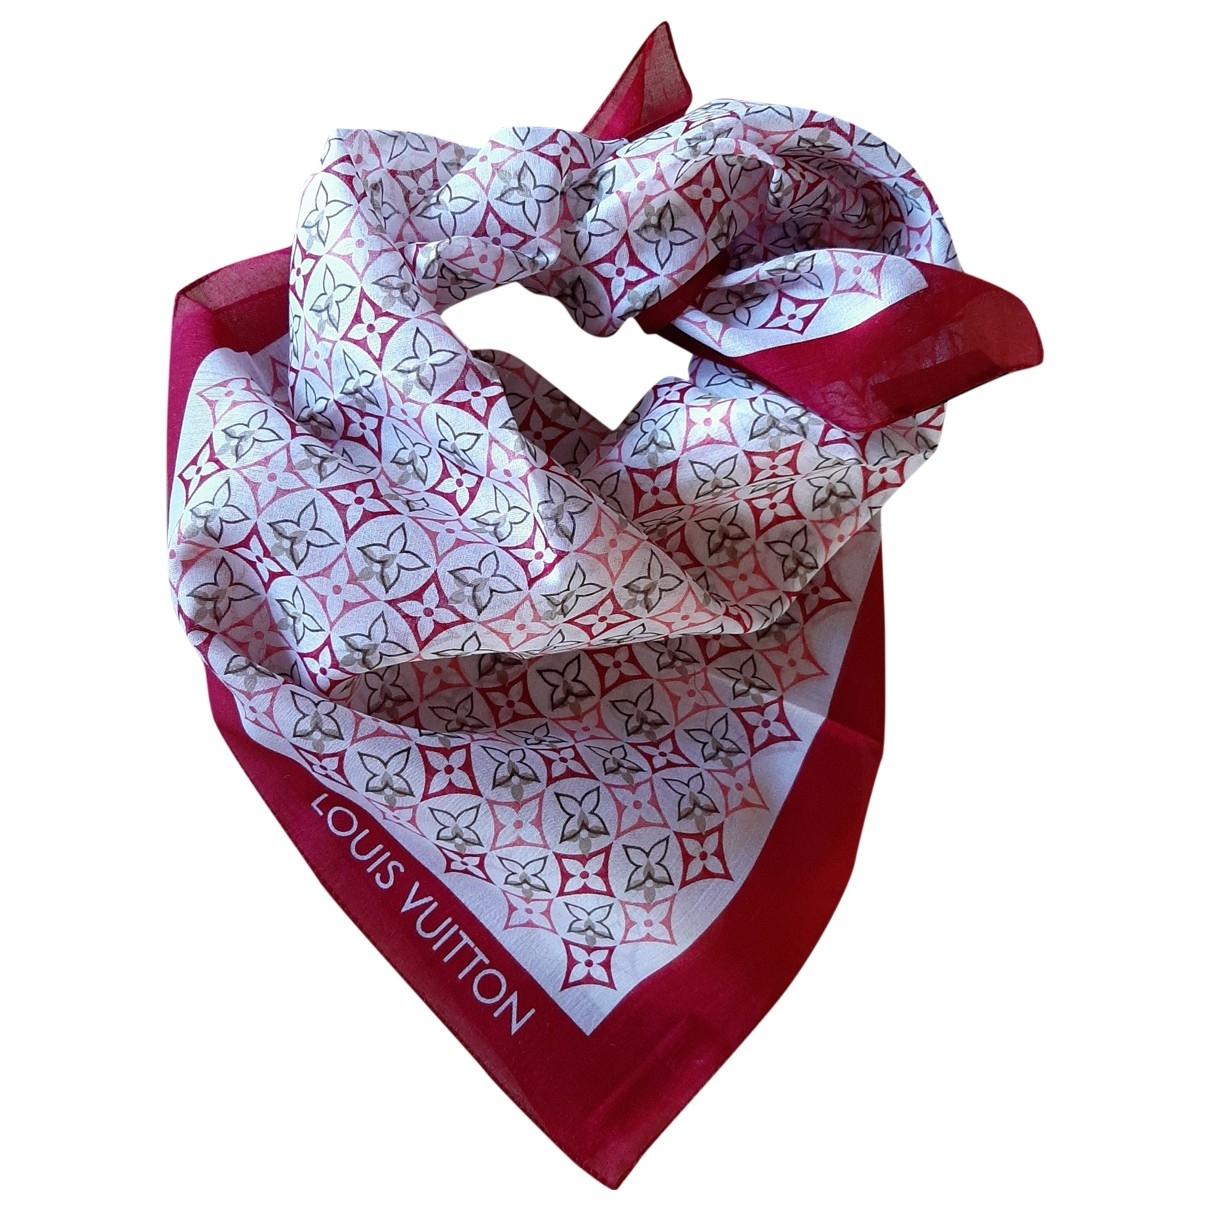 Louis Vuitton N Multicolour Cotton scarf for Women N